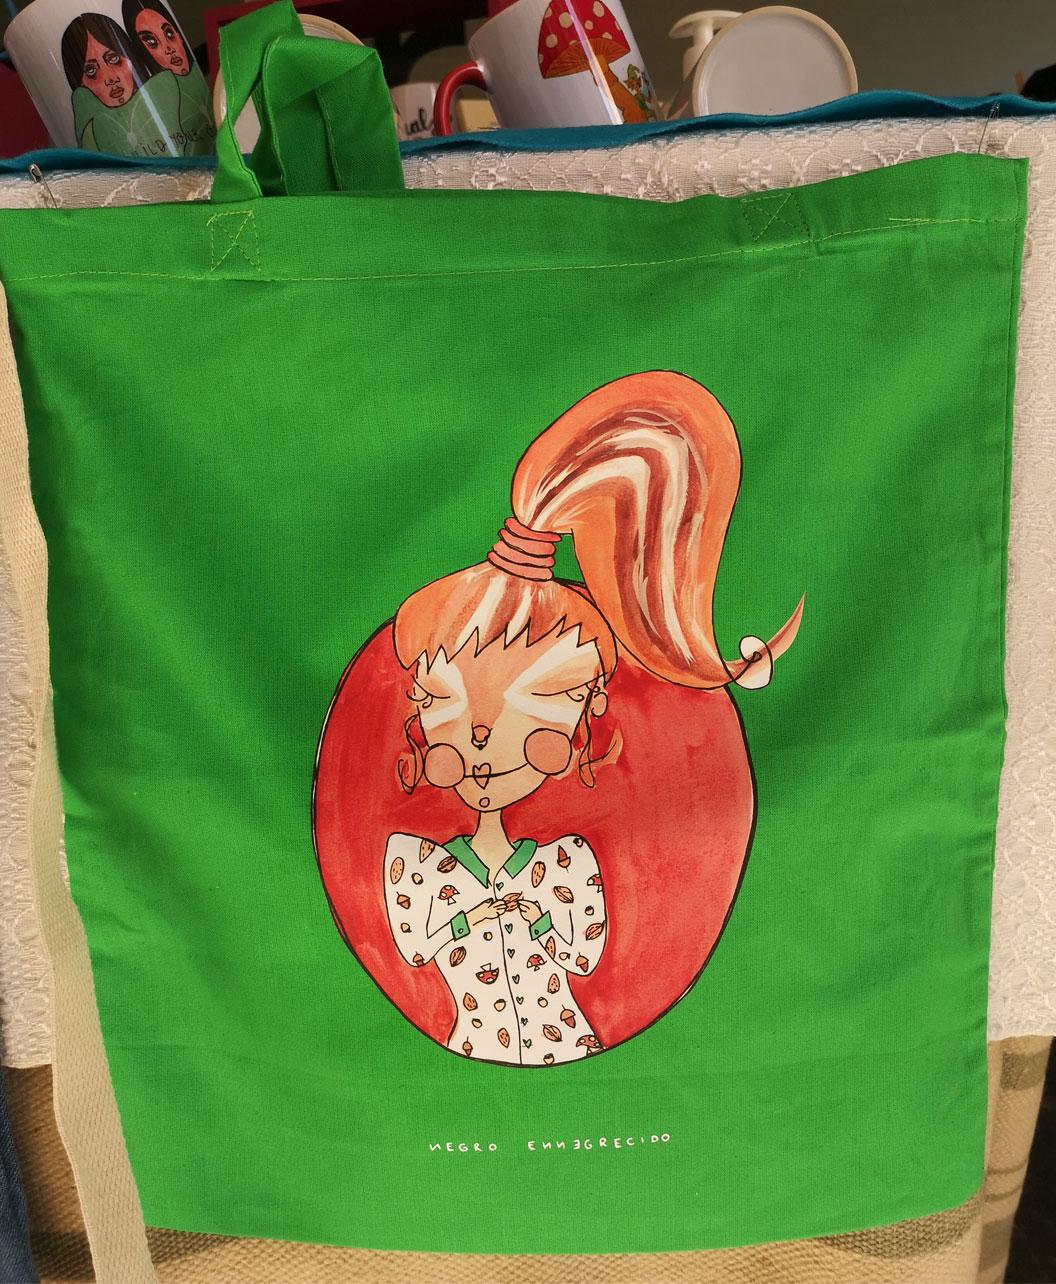 tote bag verde bolsa de tela alegre colorido original ideal regalo ardilla otono